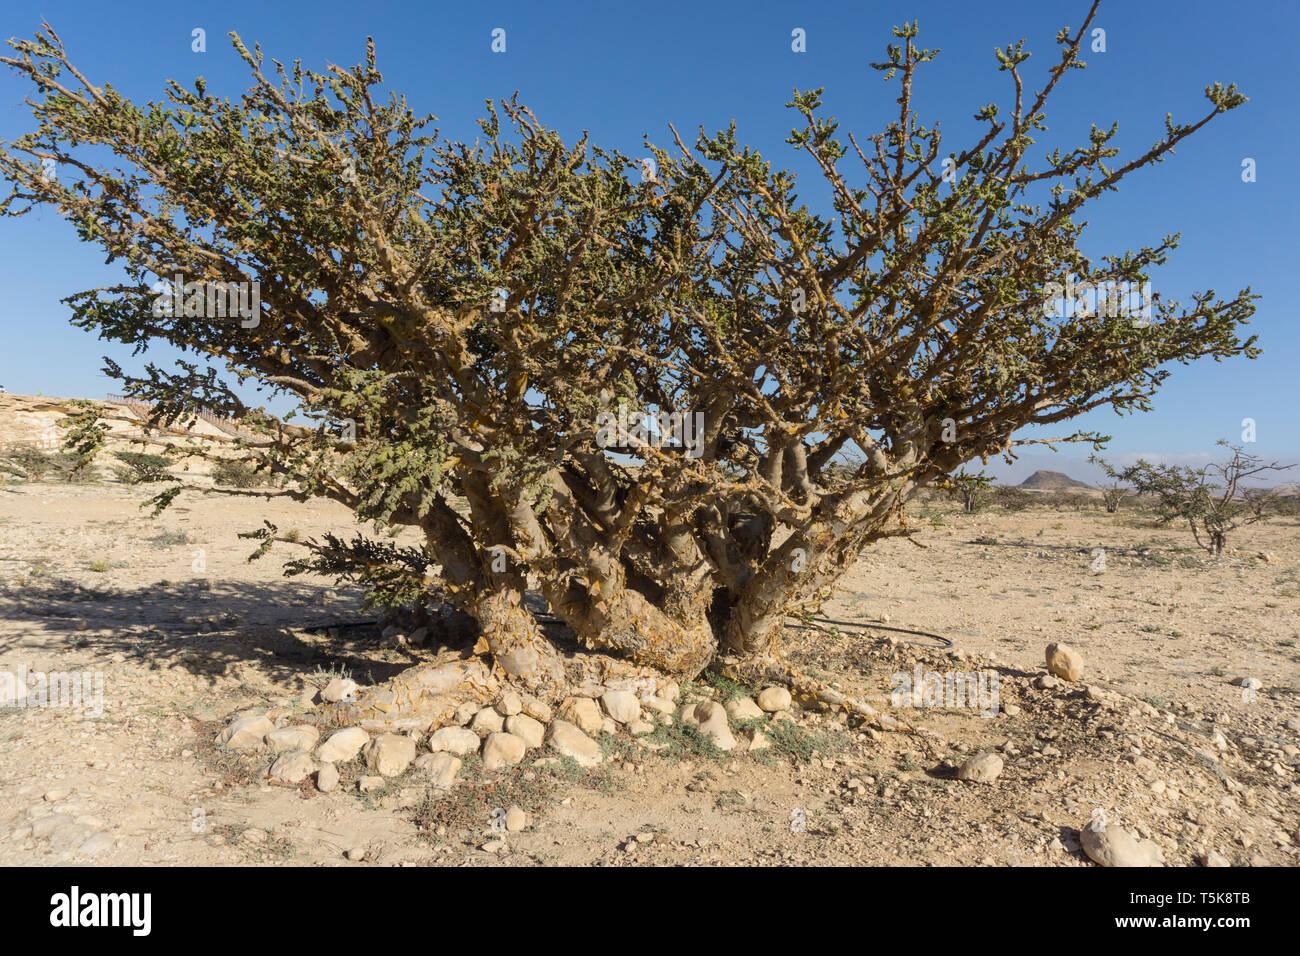 Frankincense tree, Dhofar, Oman Stock Photo